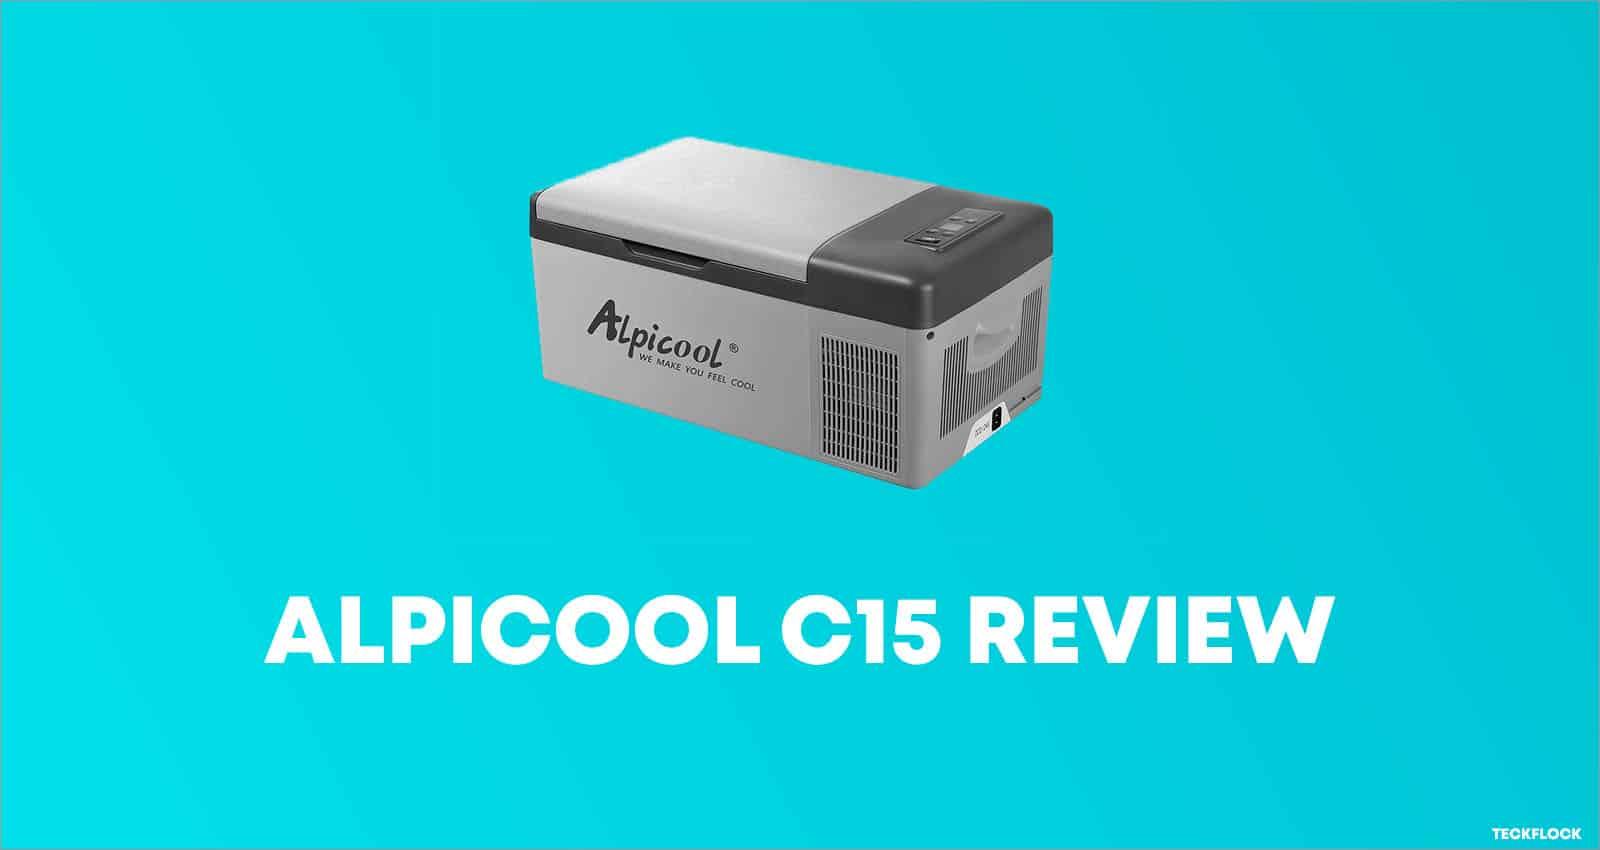 Alpicool C15 Review